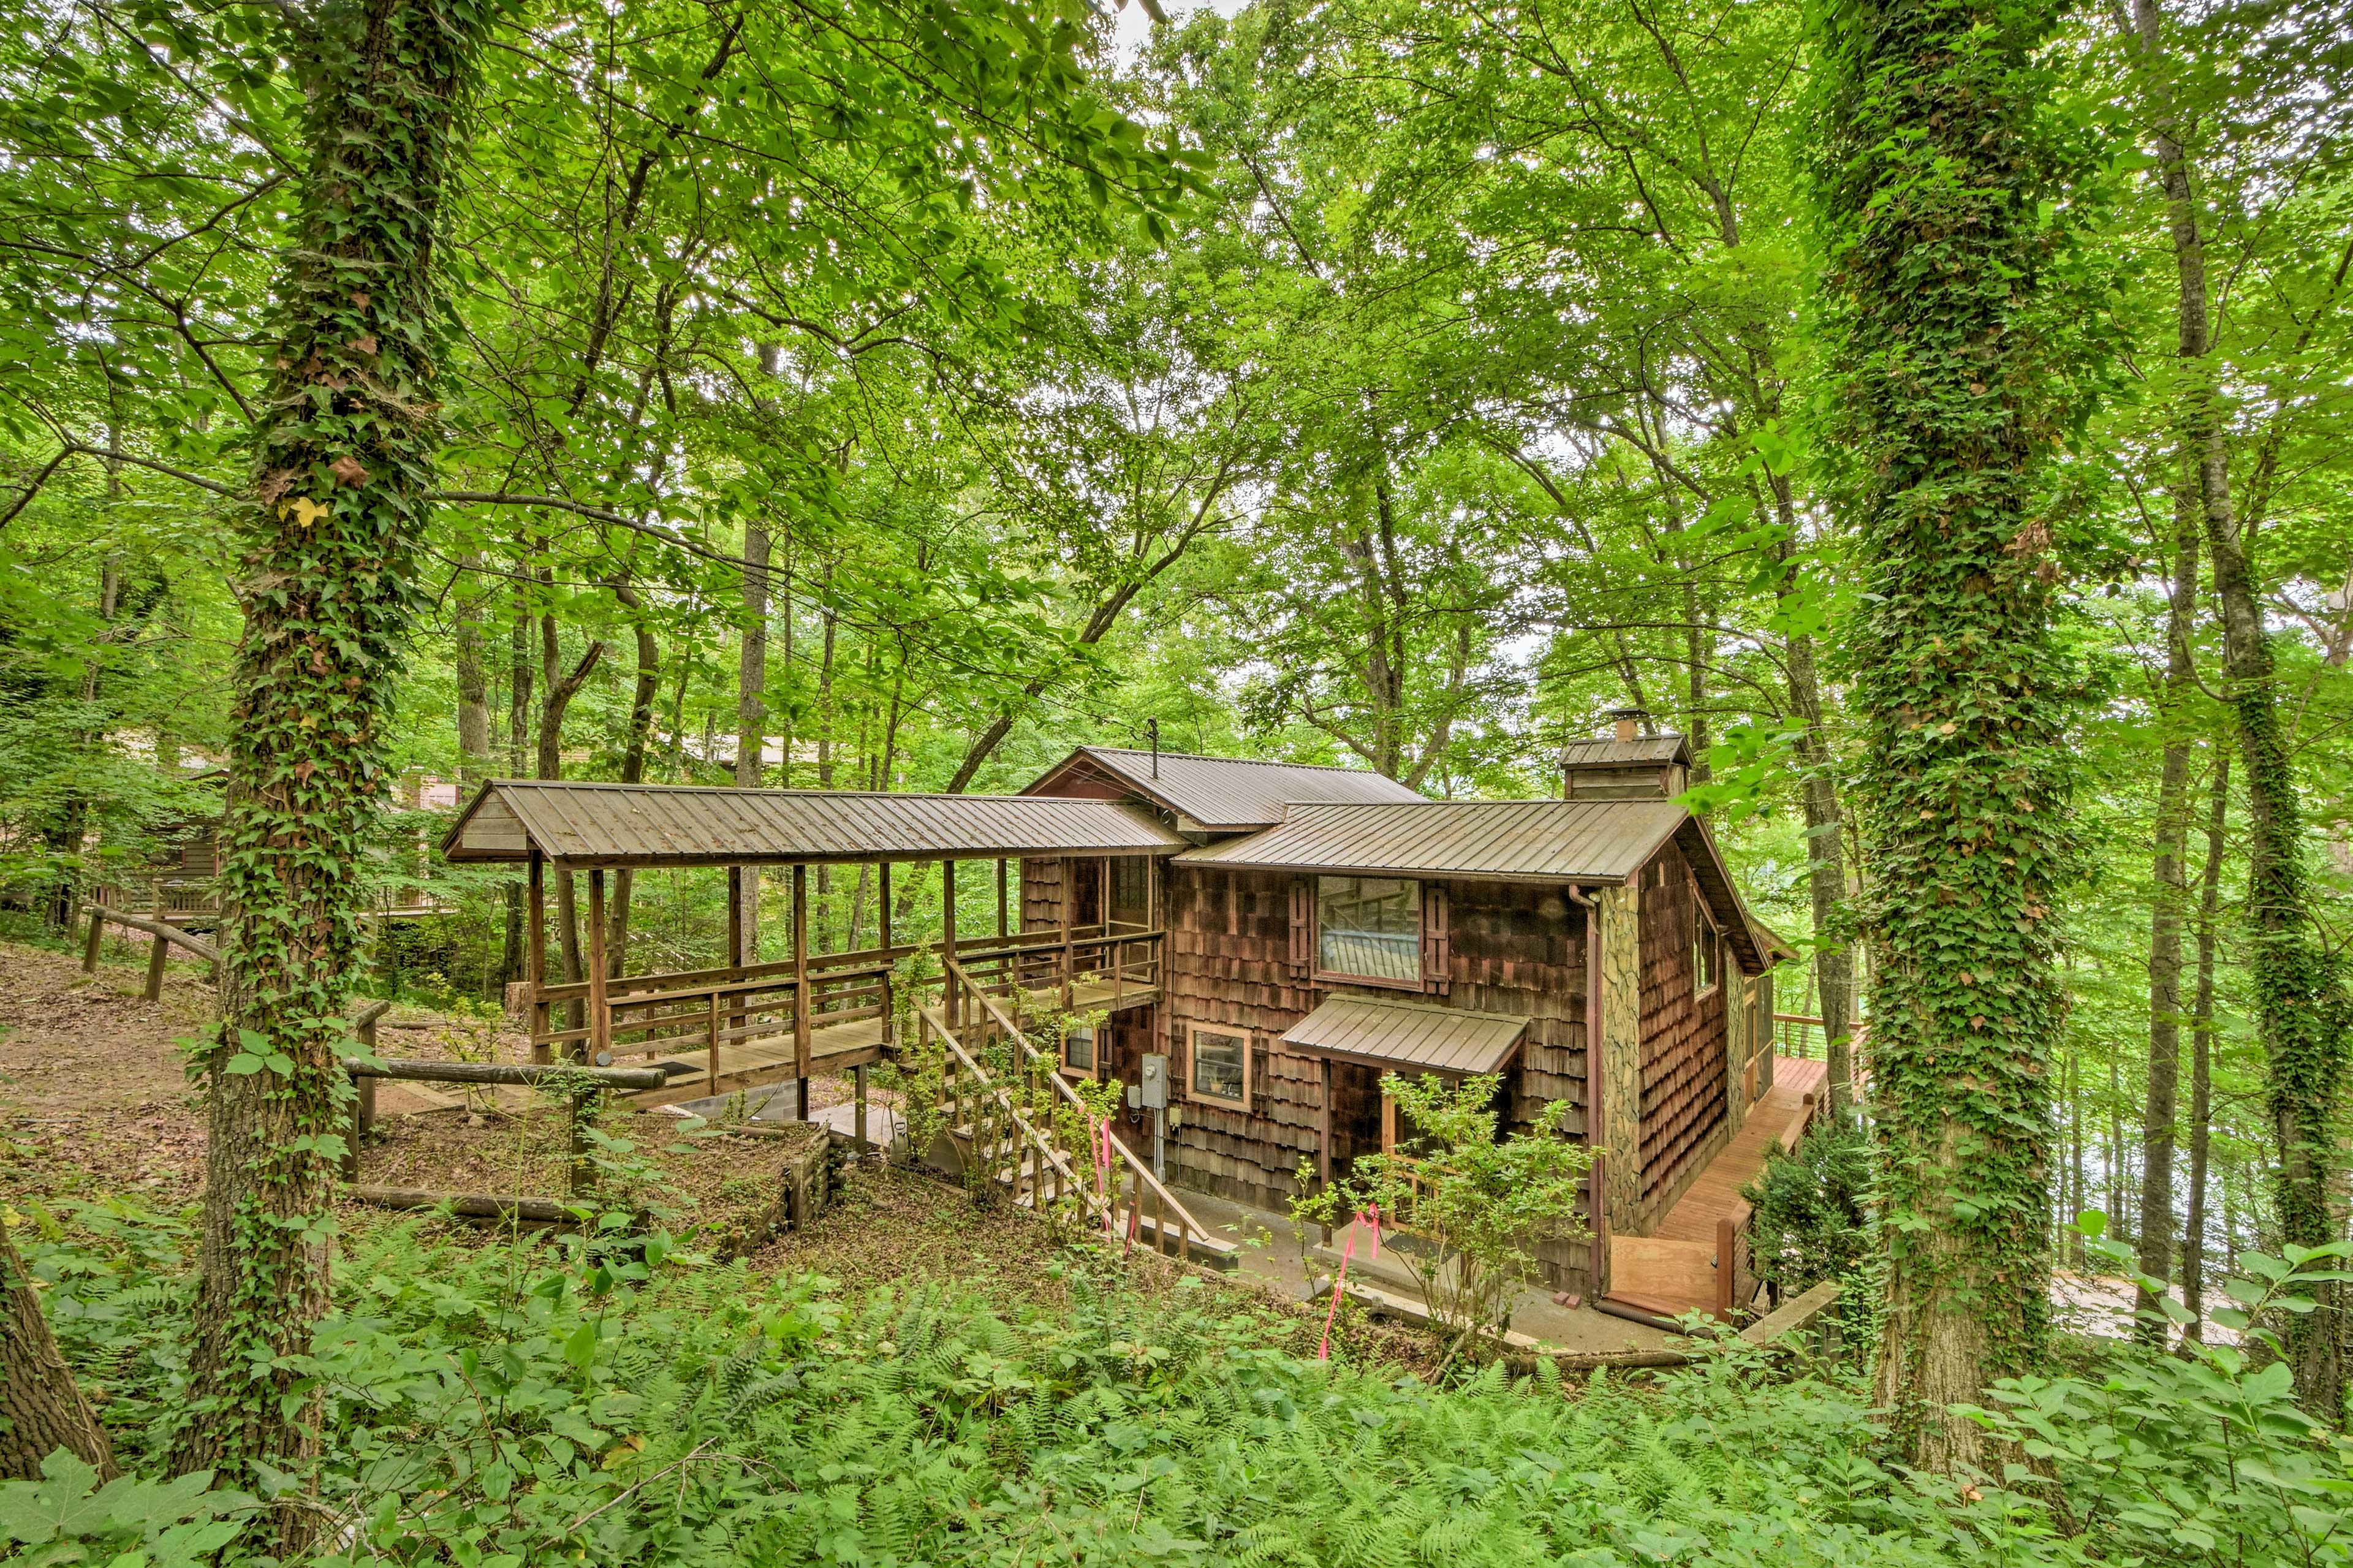 Enjoy serene surroundings at this lakeside Blue Ridge home!